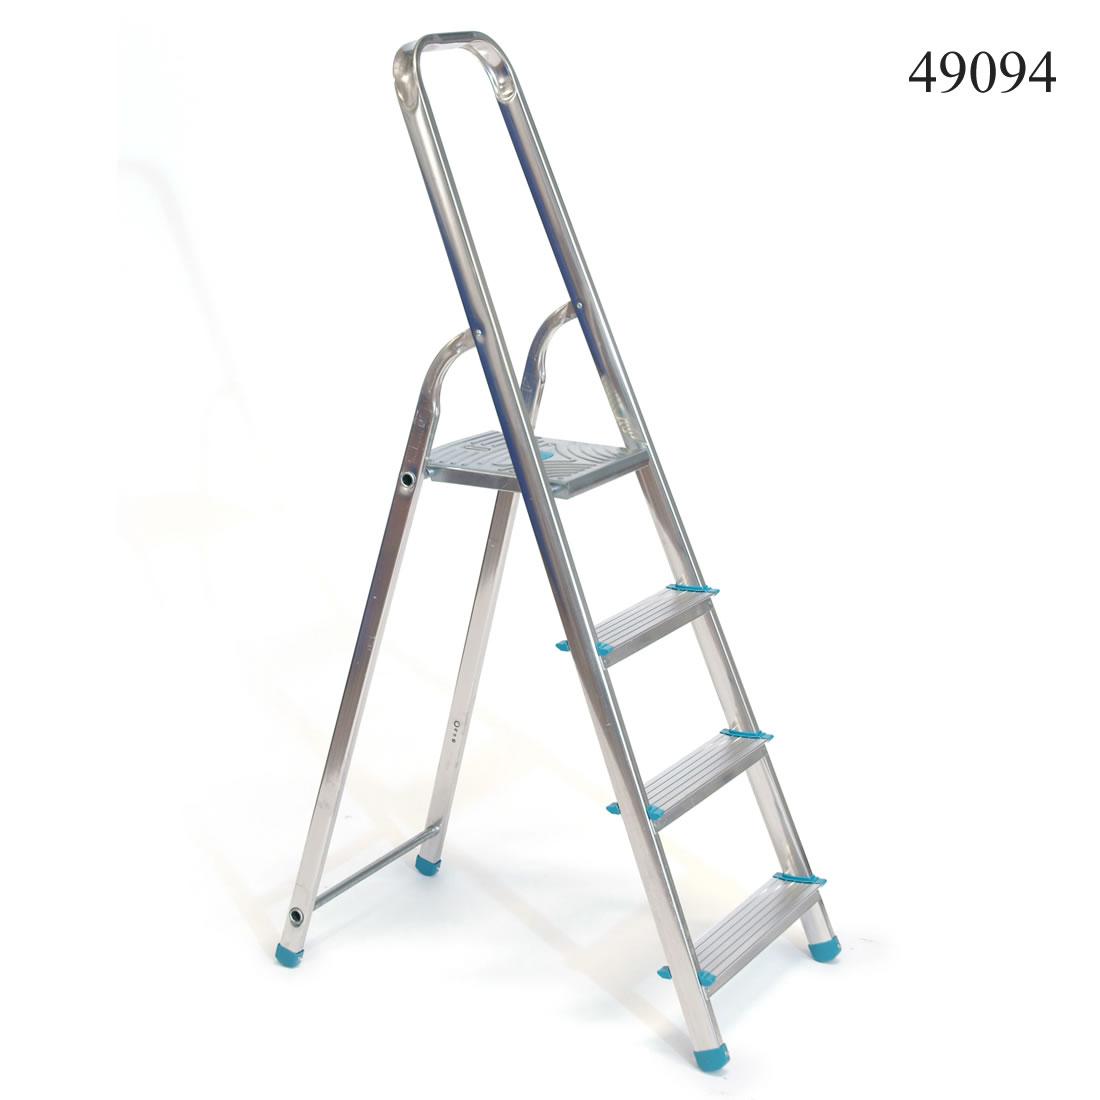 2,85m (model 49094)